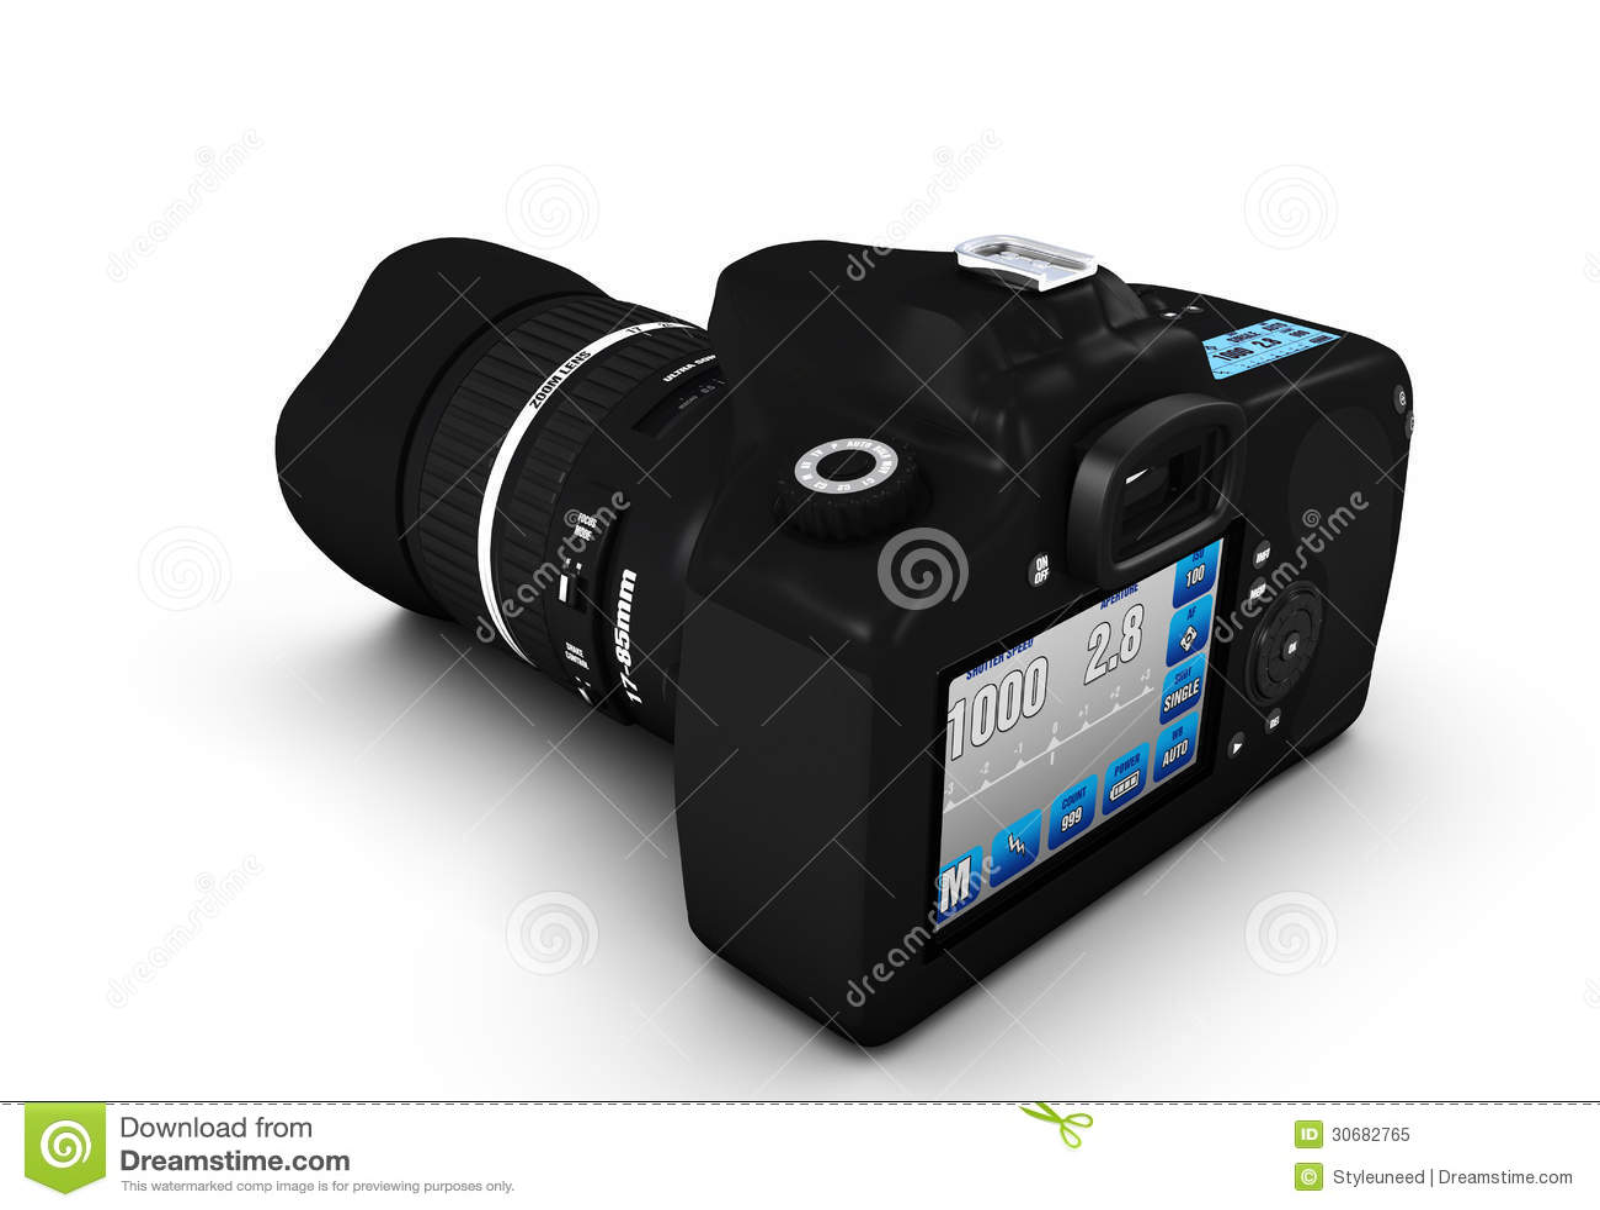 Camera 3d Dslr Camera dslr camera 3d model stock illustration image 57421229 of royalty free photo